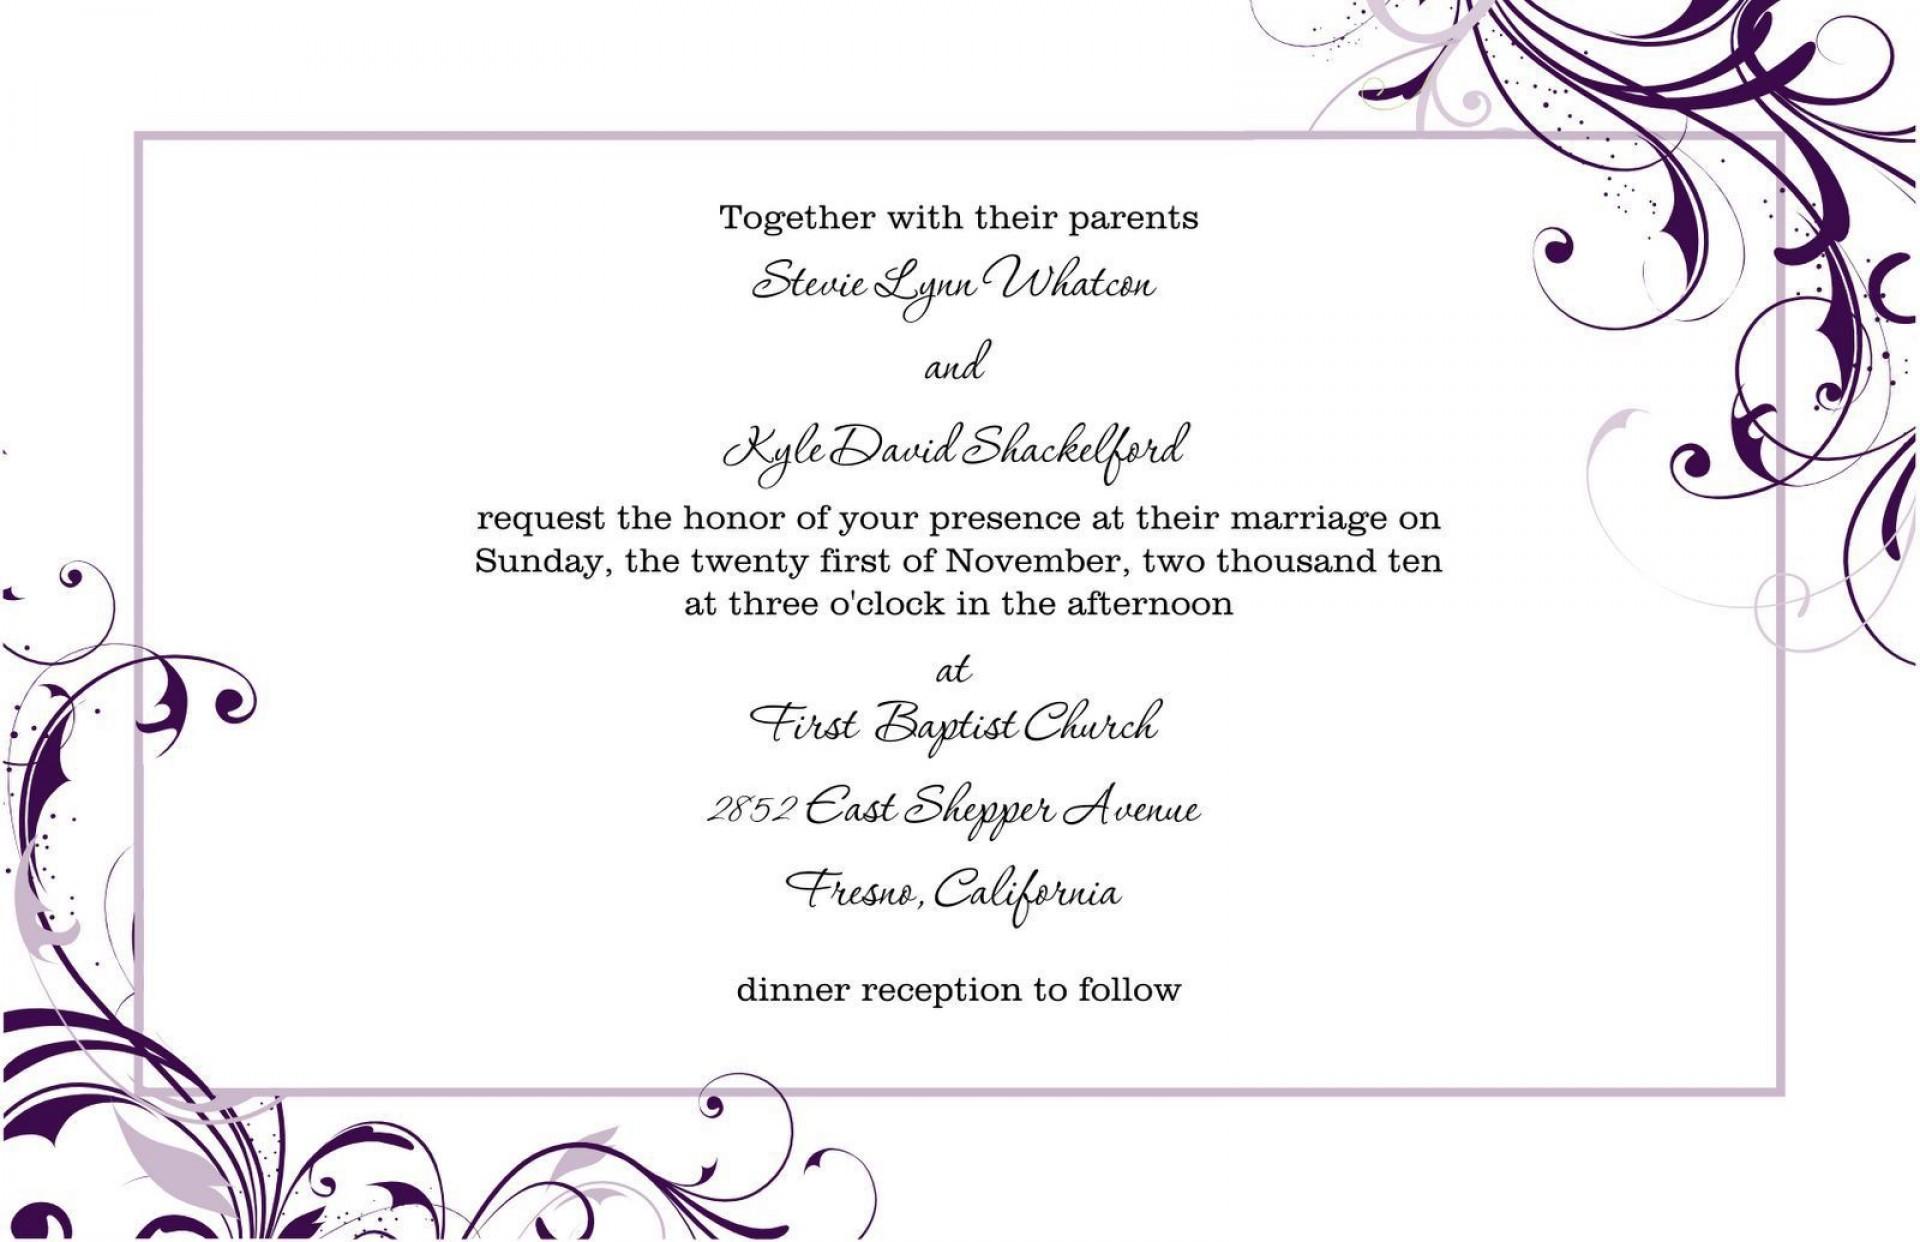 006 Singular Wedding Invitation Template Word High Resolution  Invite Wording Uk Anniversary Microsoft Free Marriage1920